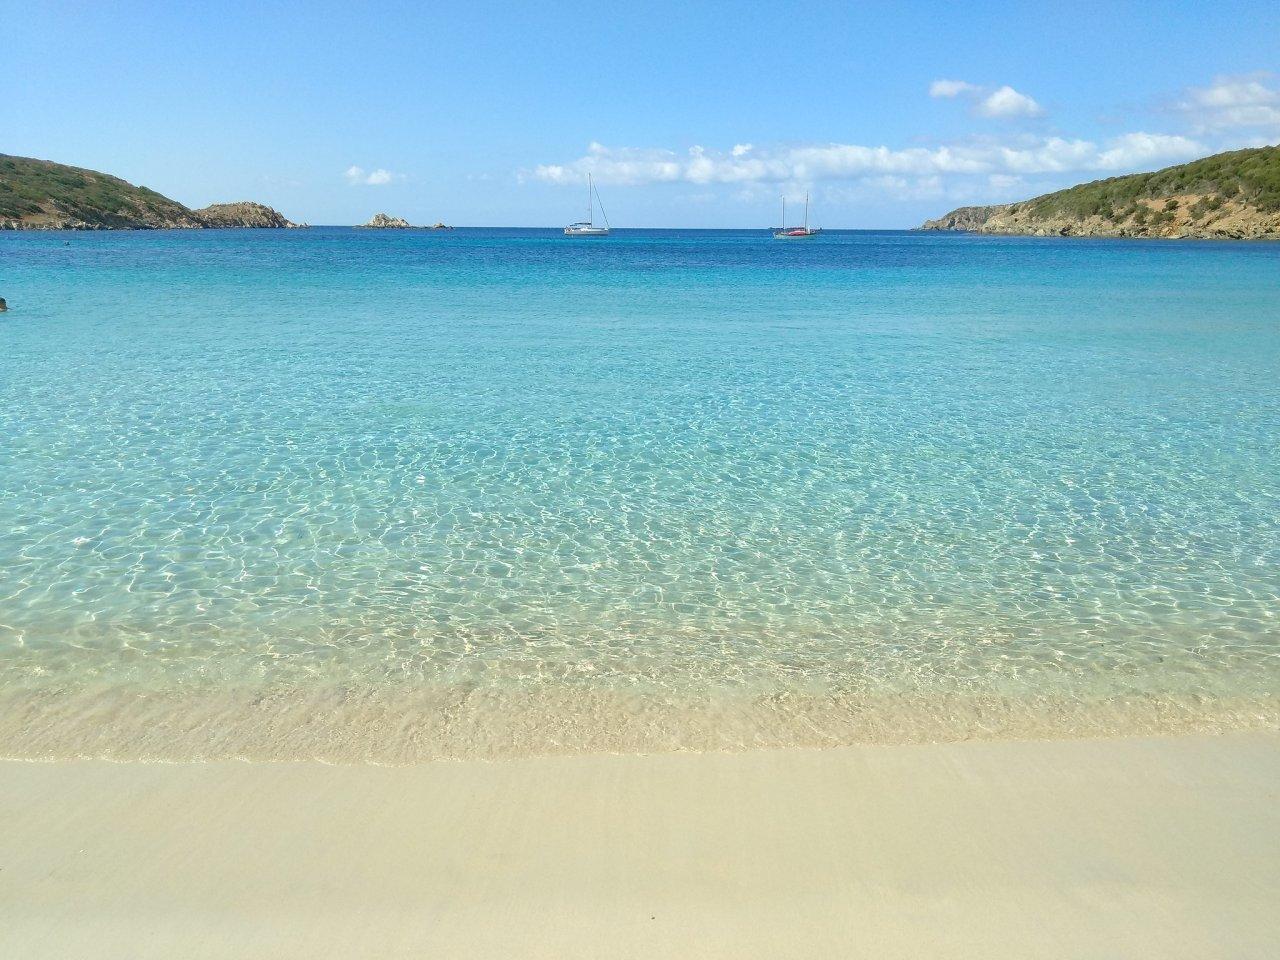 Spiaggia di Tuerredda, Sardinia, Best Italy Beaches